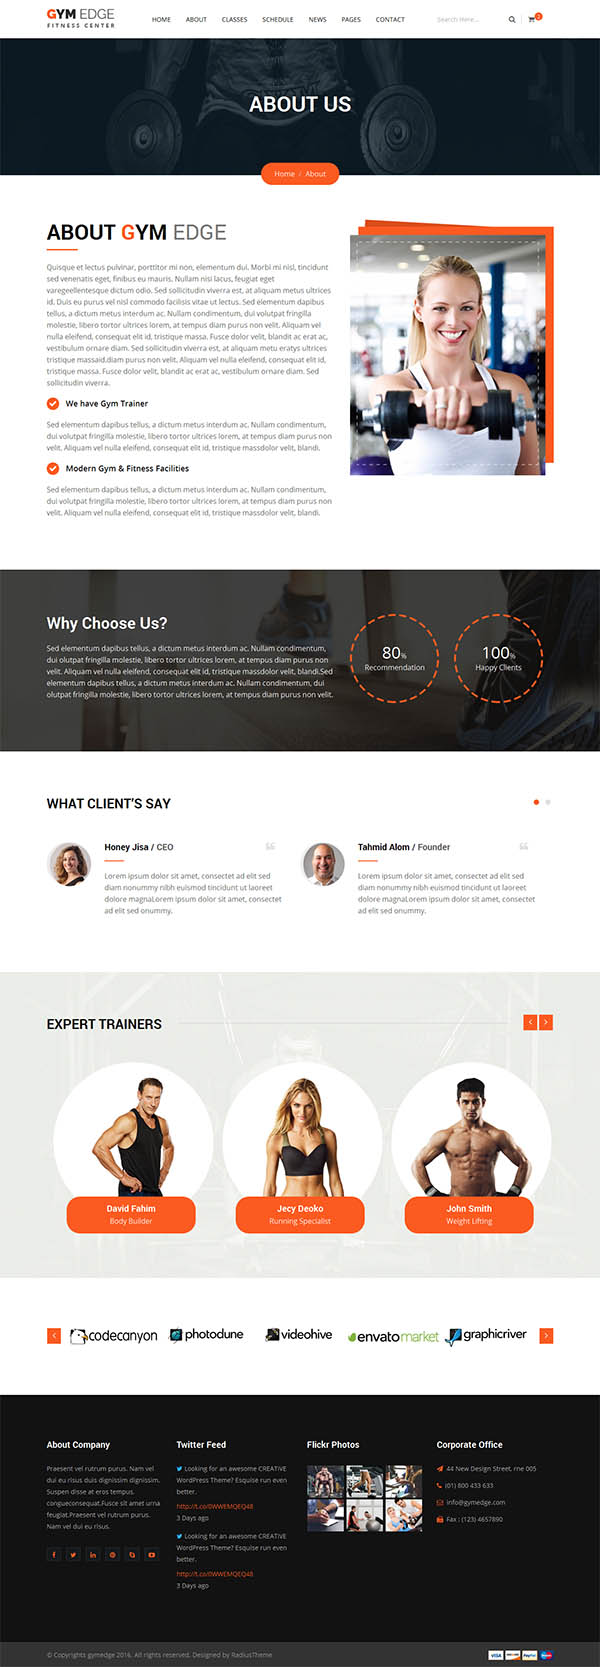 GYM Edge - Gym & Fitness HTML5 Responsive Template